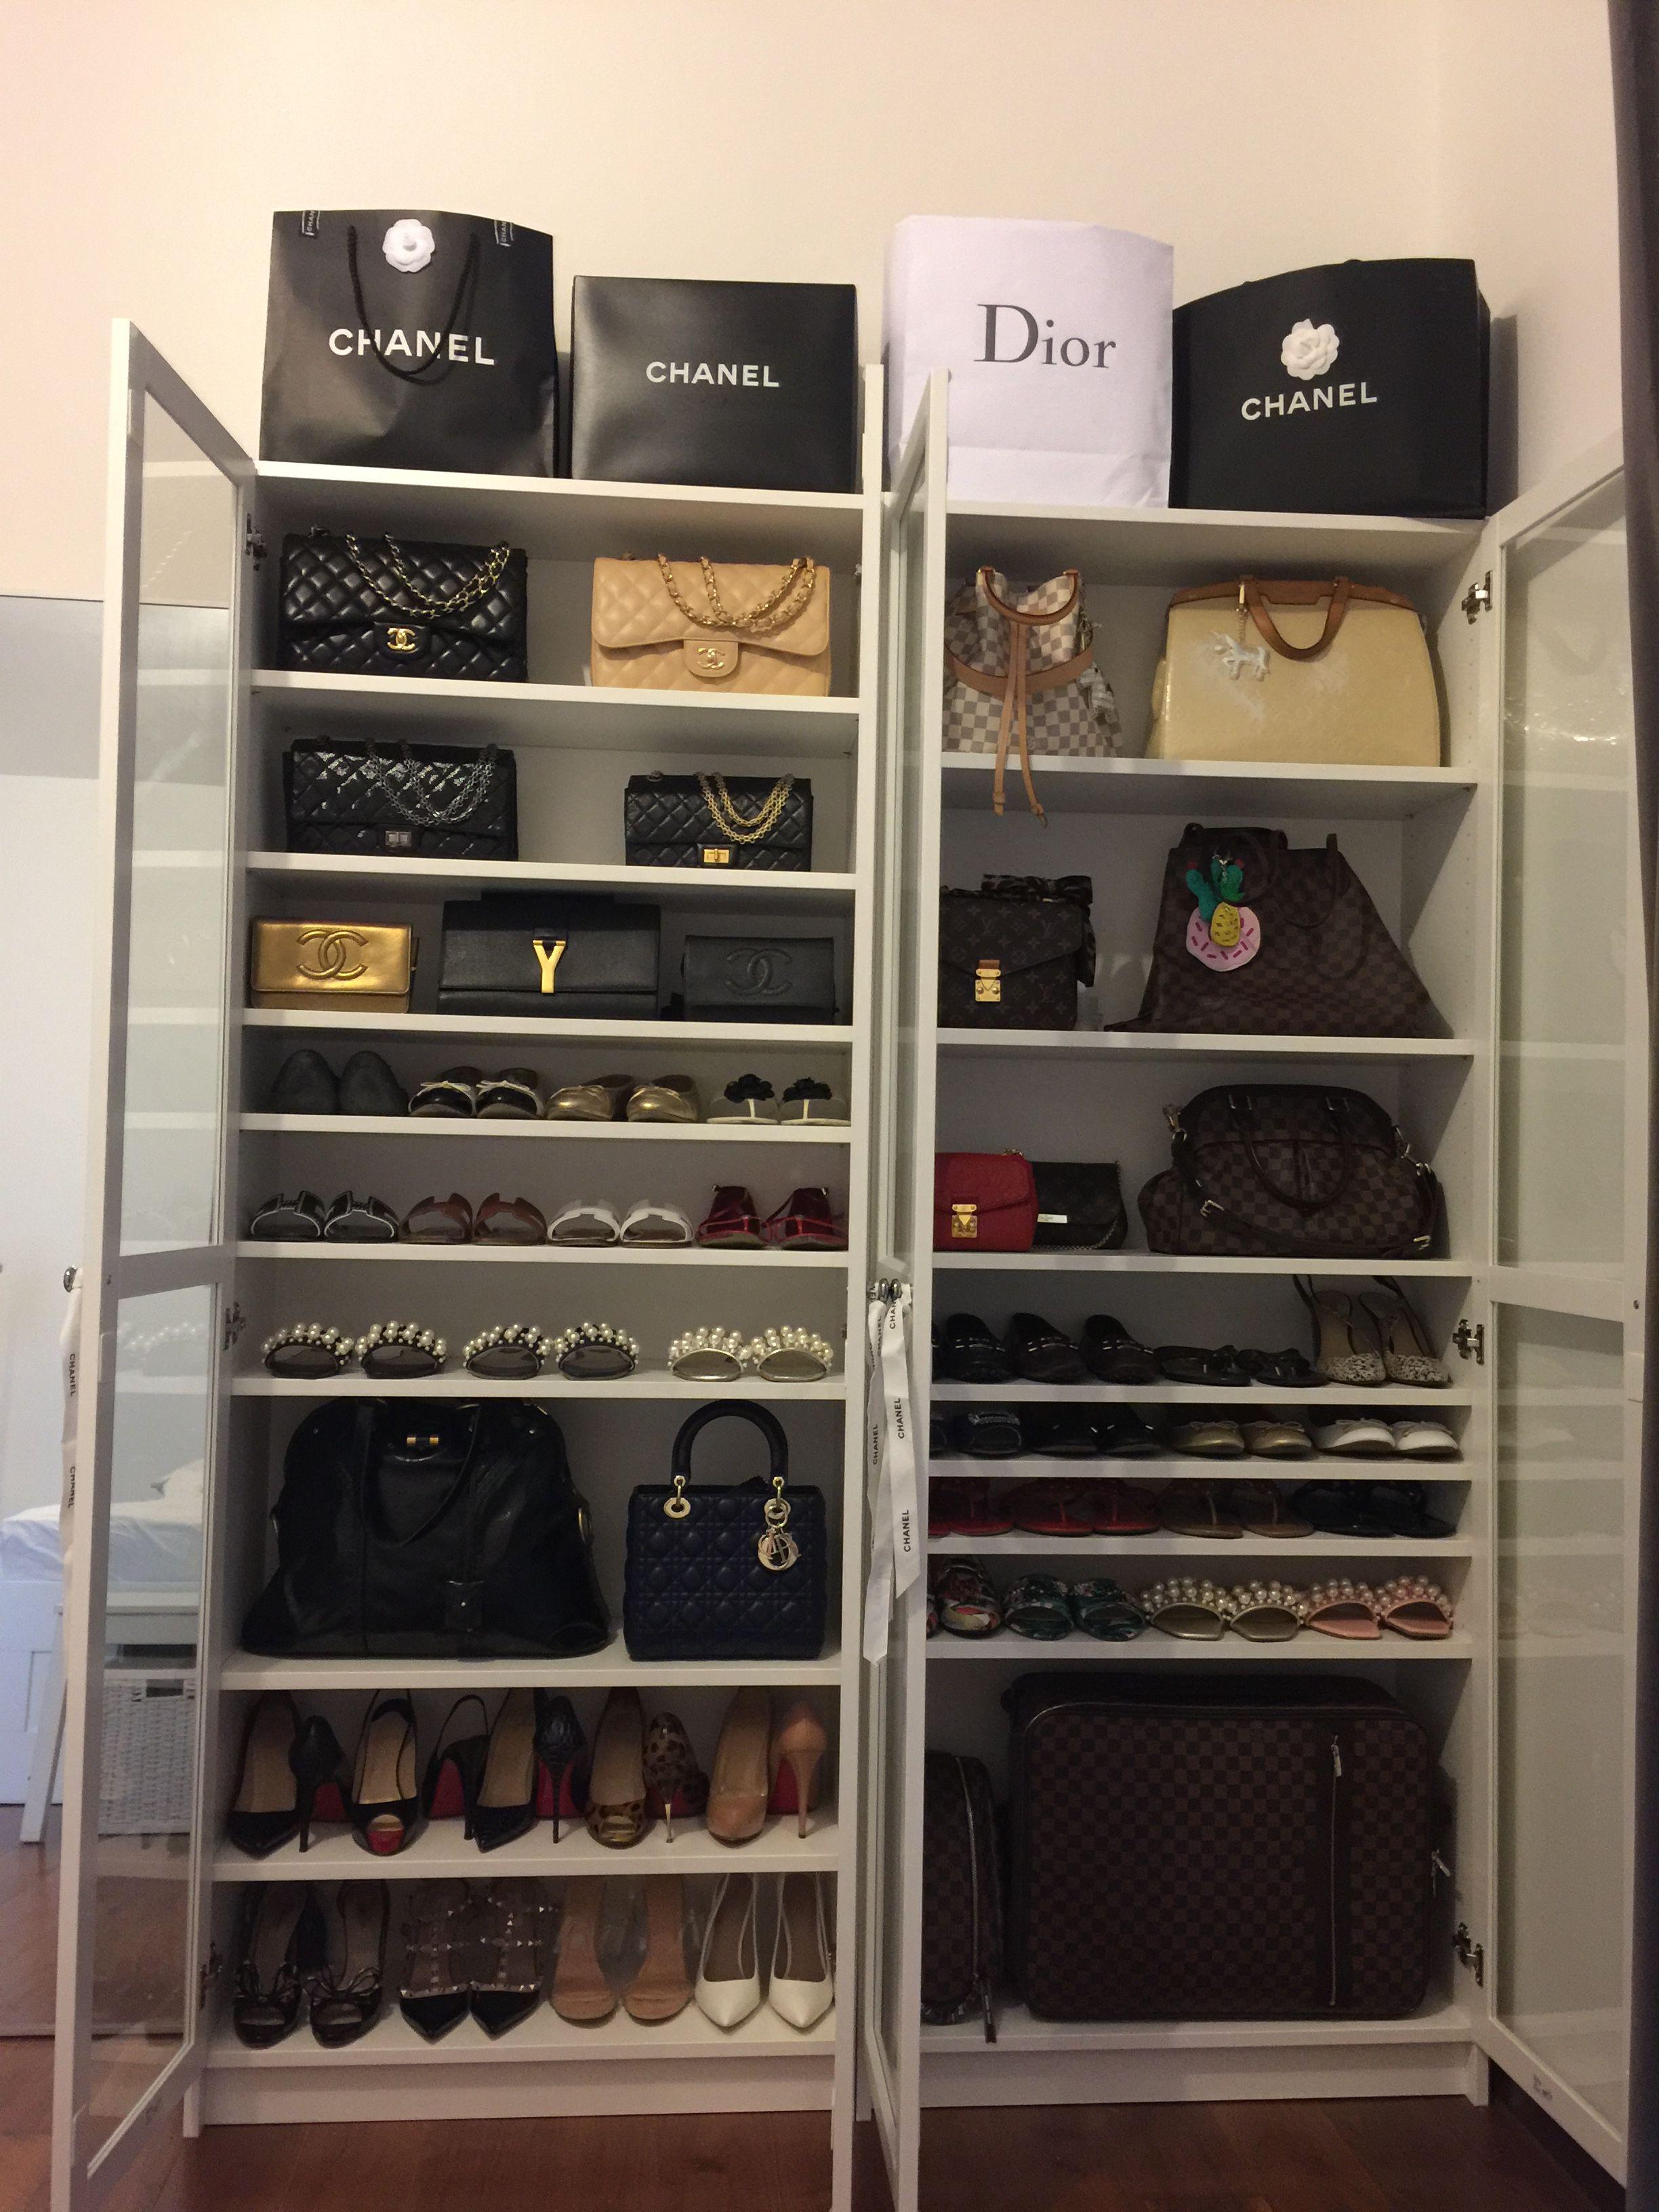 Handbag And Shoe Display Cabinet Ikeabilly Chanel Louisvuitton Toriburch Dior Valentino Ysl Hermes Sto Handbag Display Display Cabinet Closet Designs